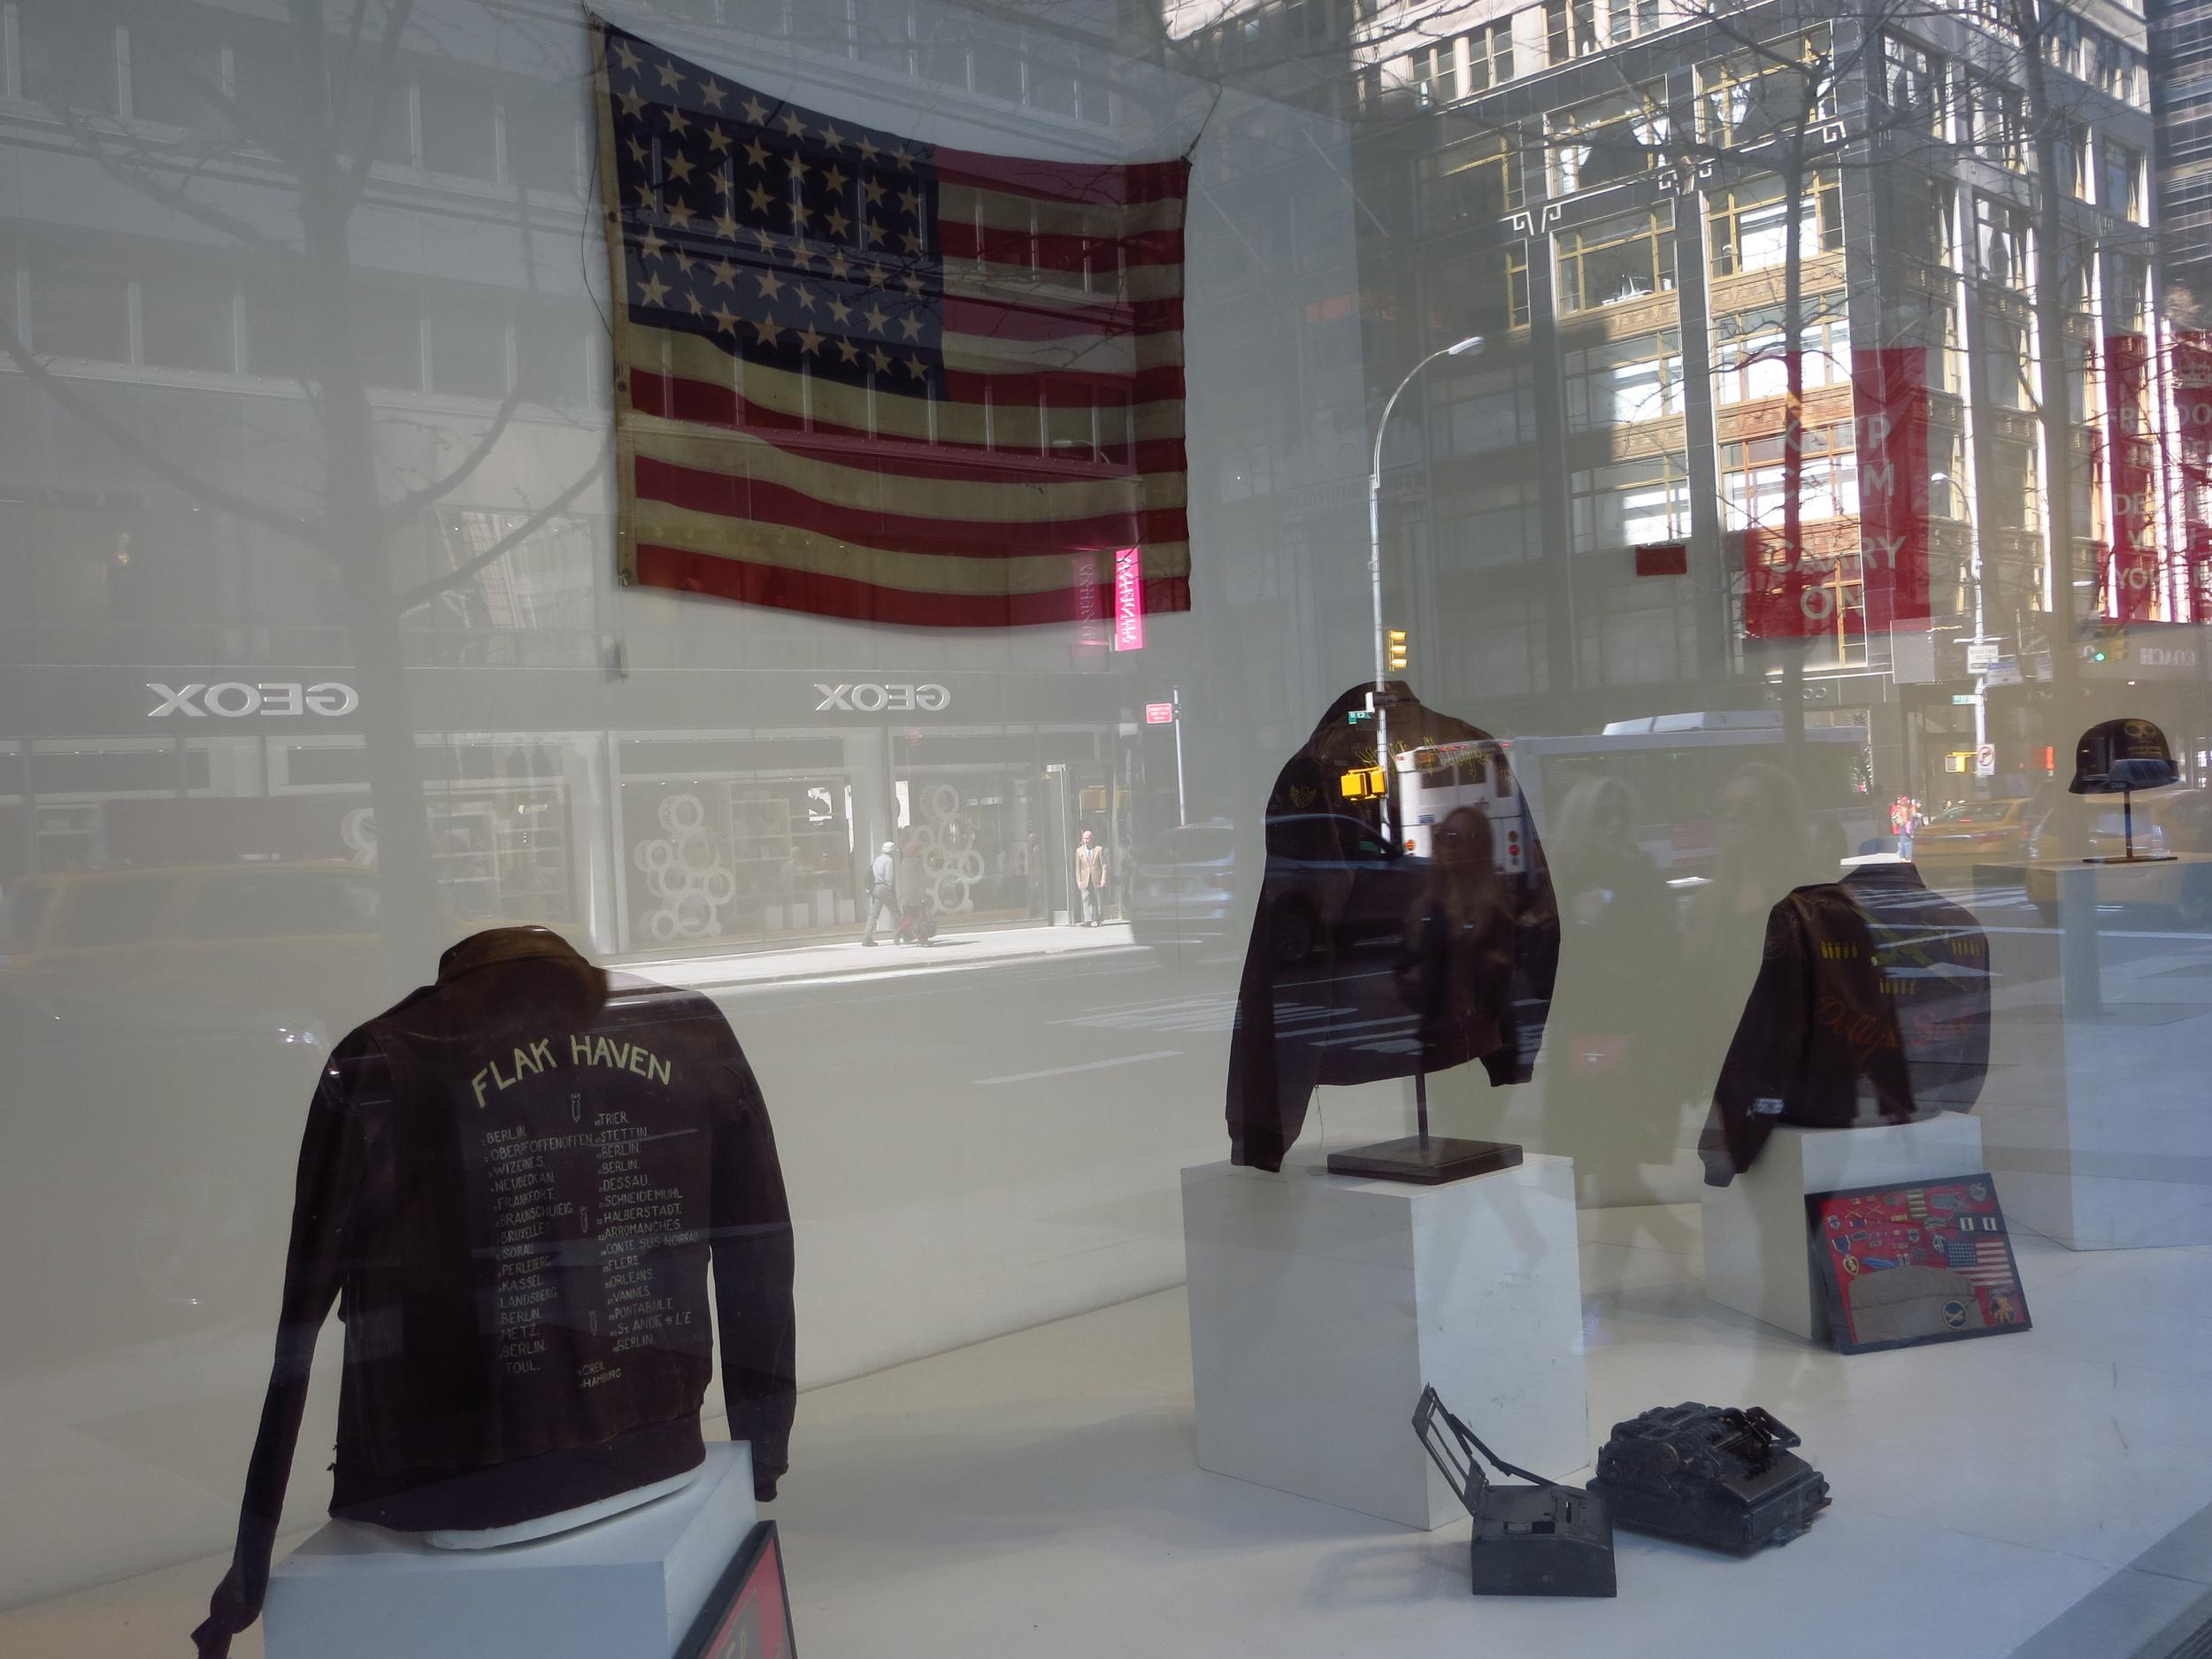 Bonham's Auction House display